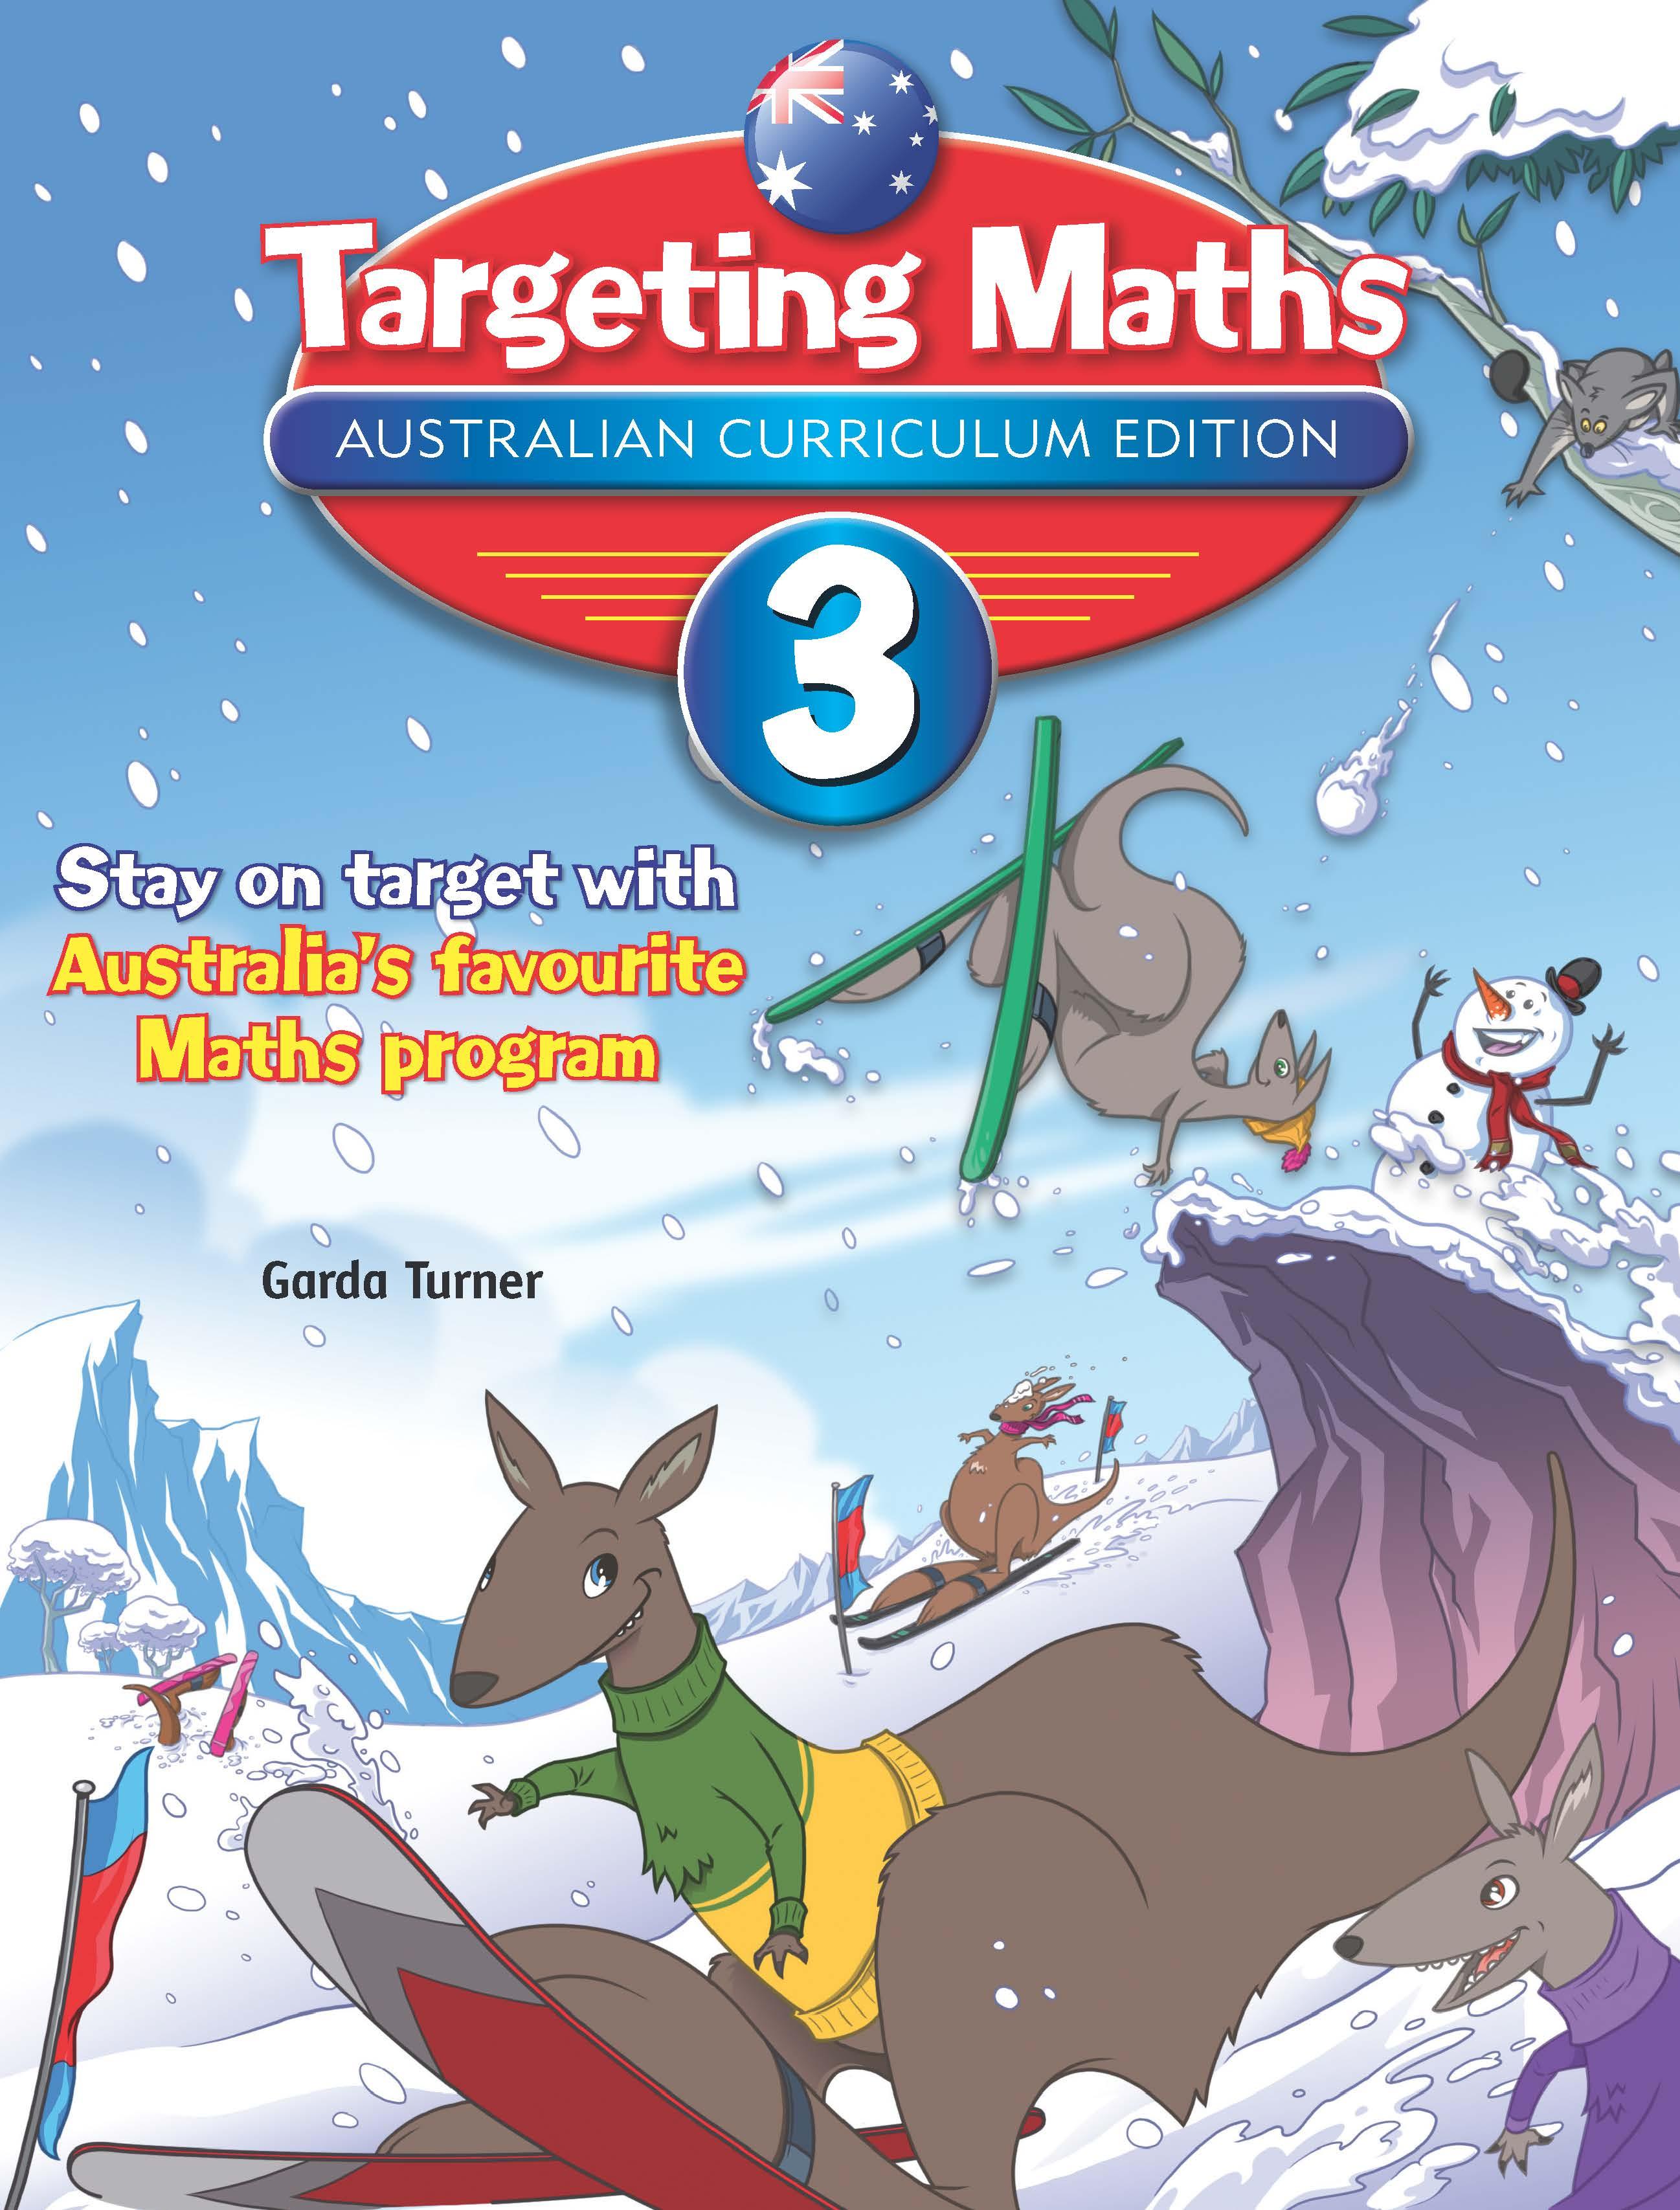 Targeting Maths Australian Curriculum Edition Student Book Year 3